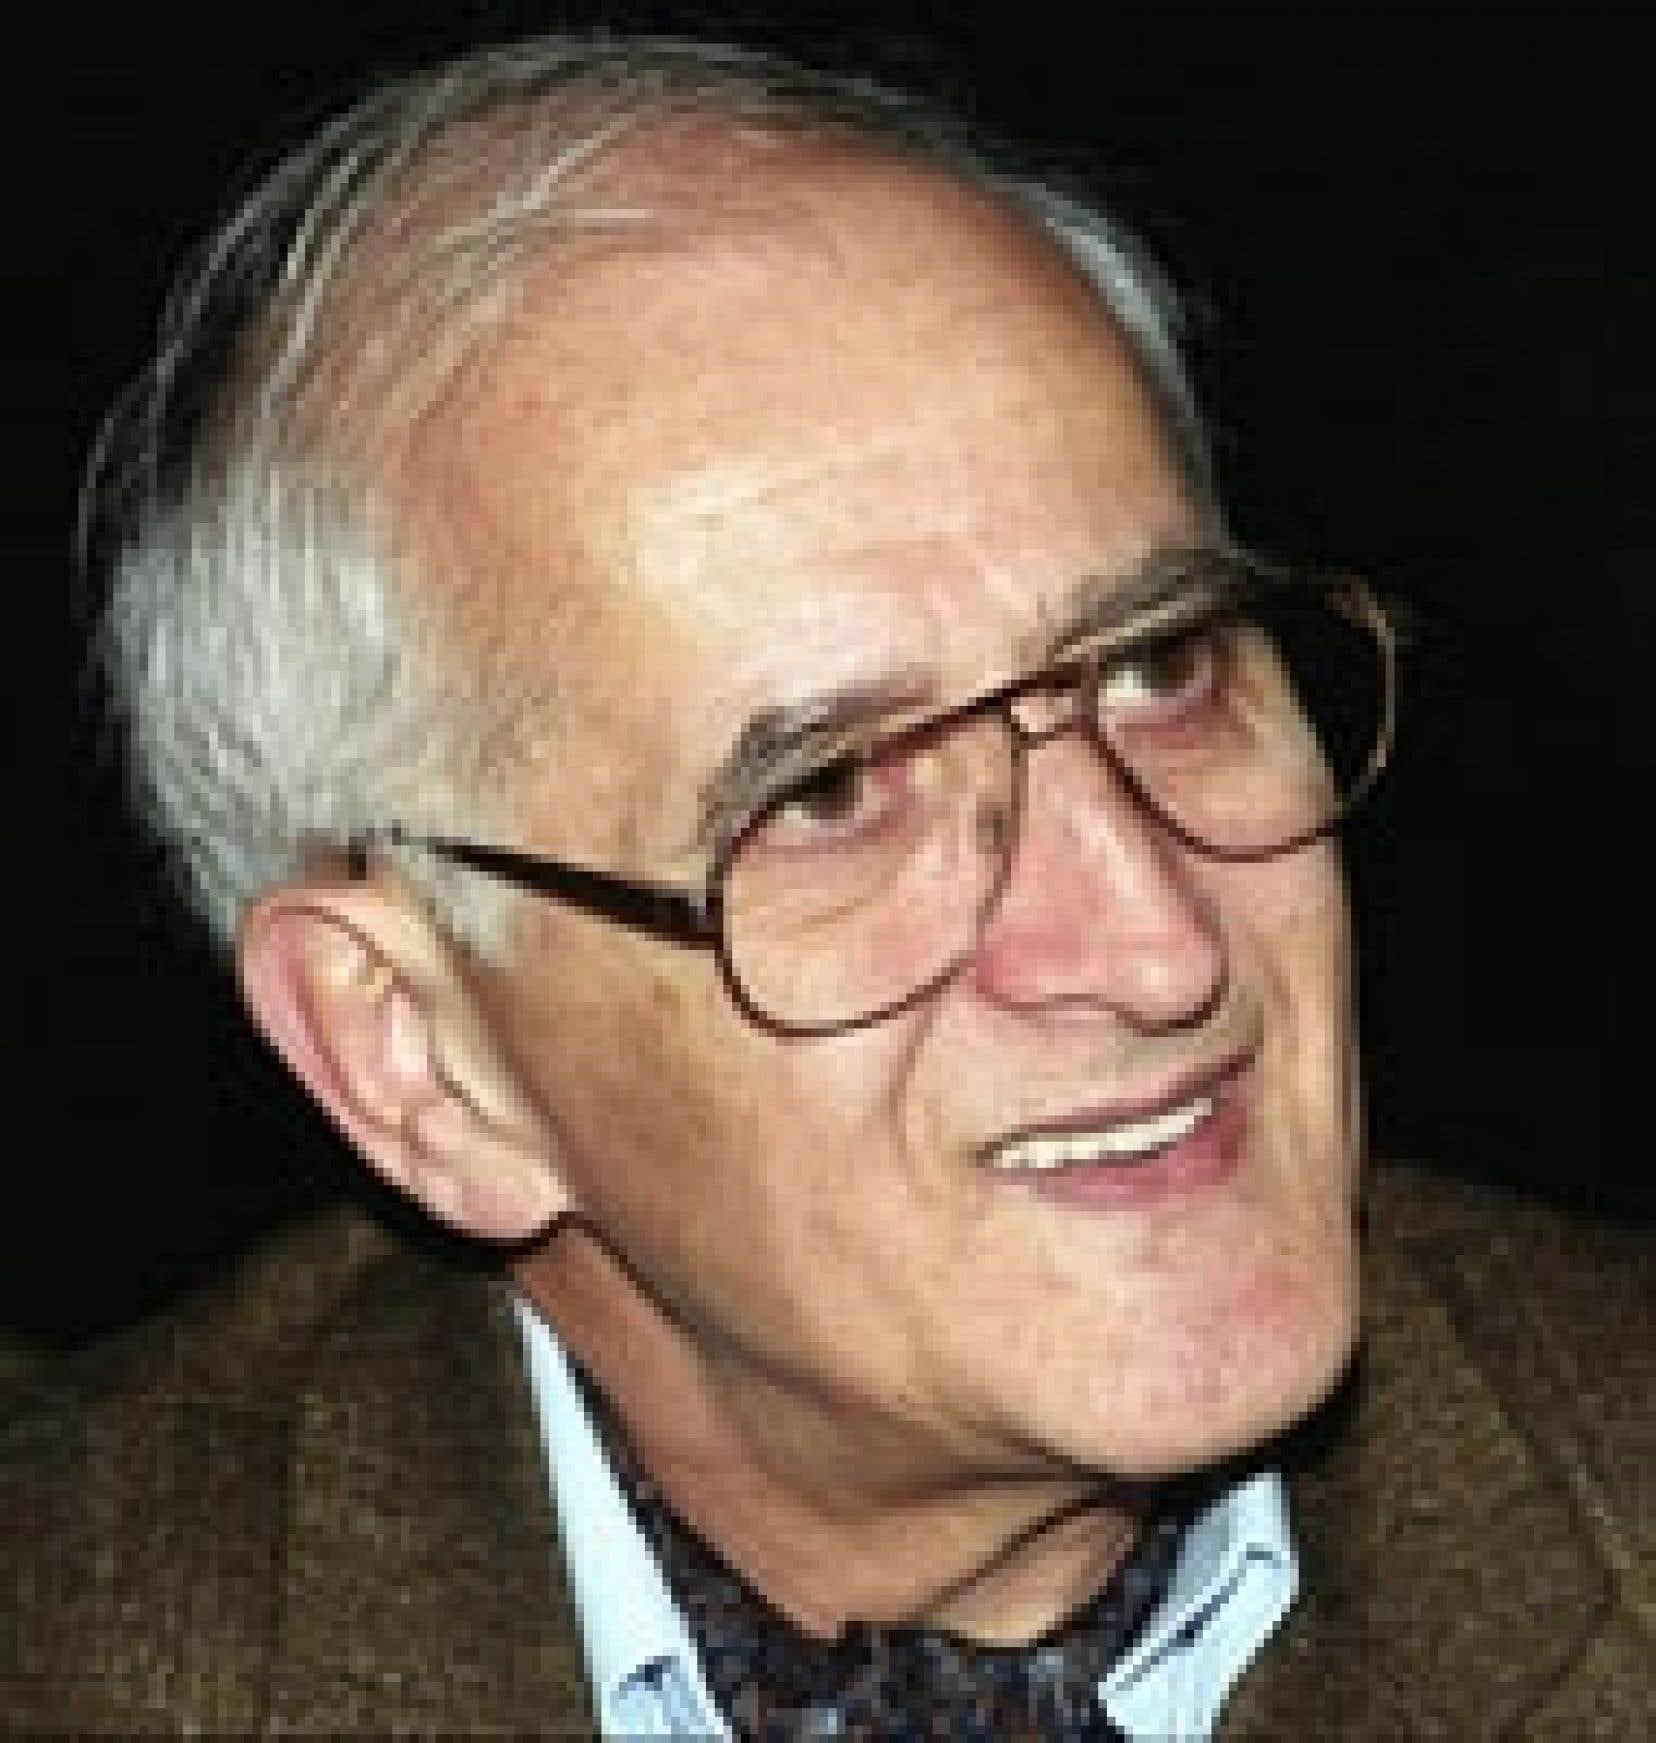 L'anthropologue Bernard Saladin d'Anglure, photographié en 2002.